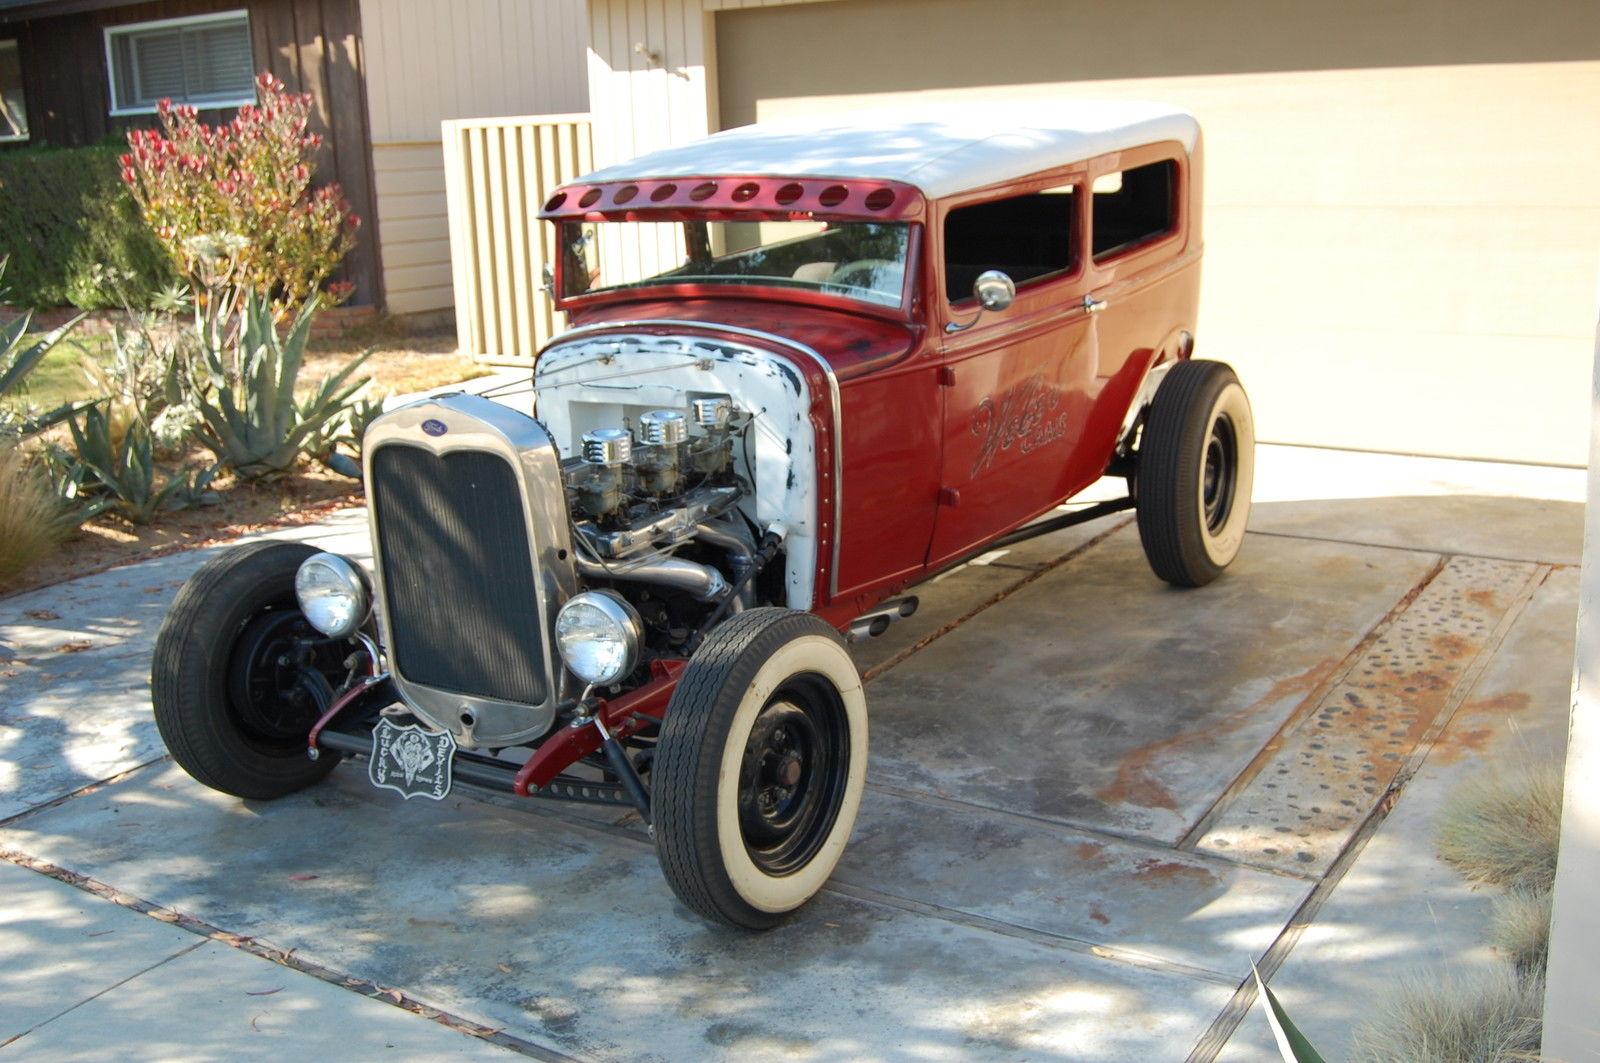 Restored Vintage 1930 Ford Model A Sedan Hot Rod 30 W 32